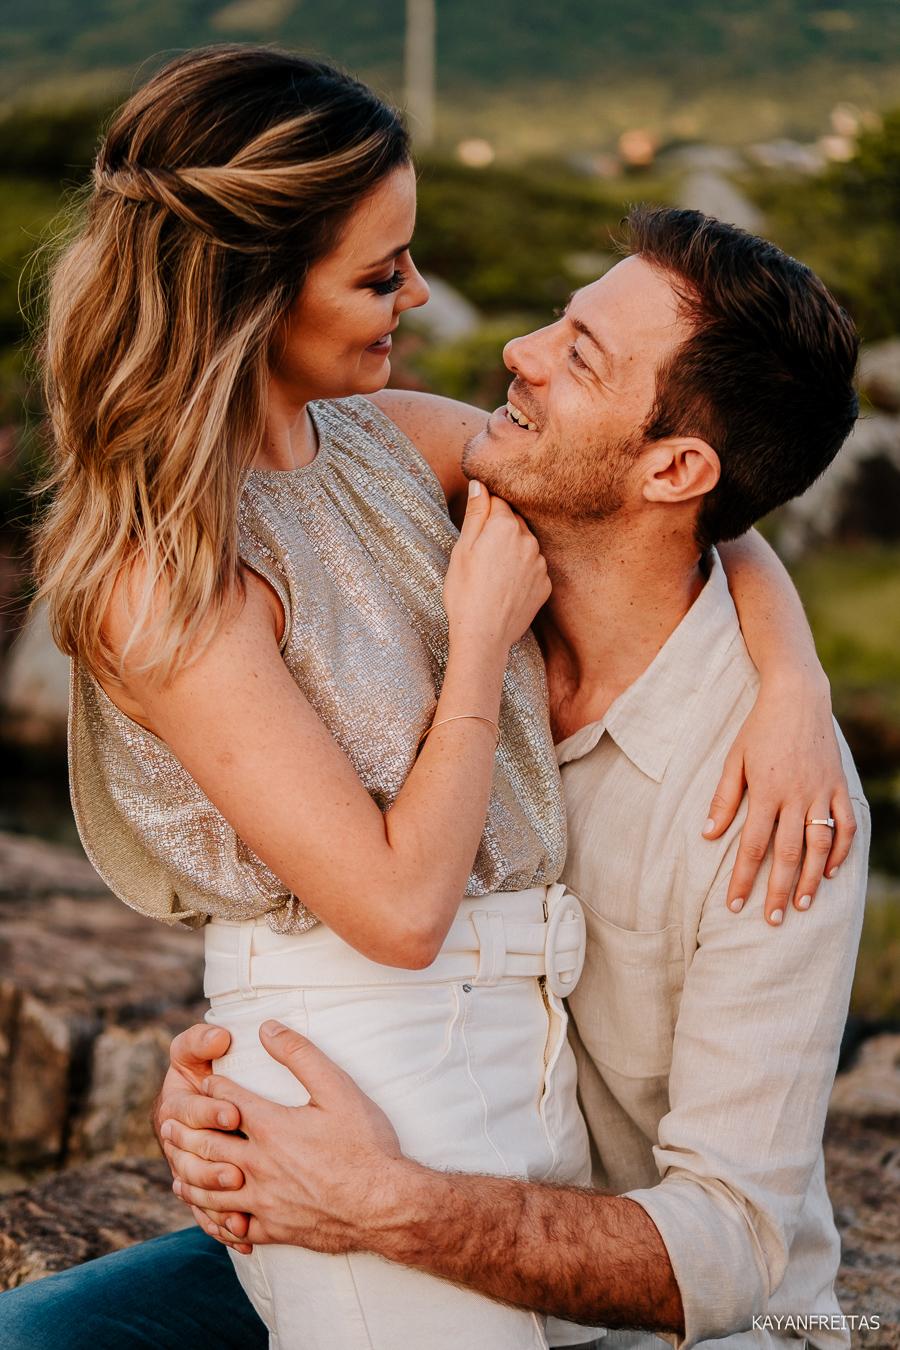 belisa-erik-prewedding-0024 Sessão pré wedding - Belisa e Erik - Florianópolis